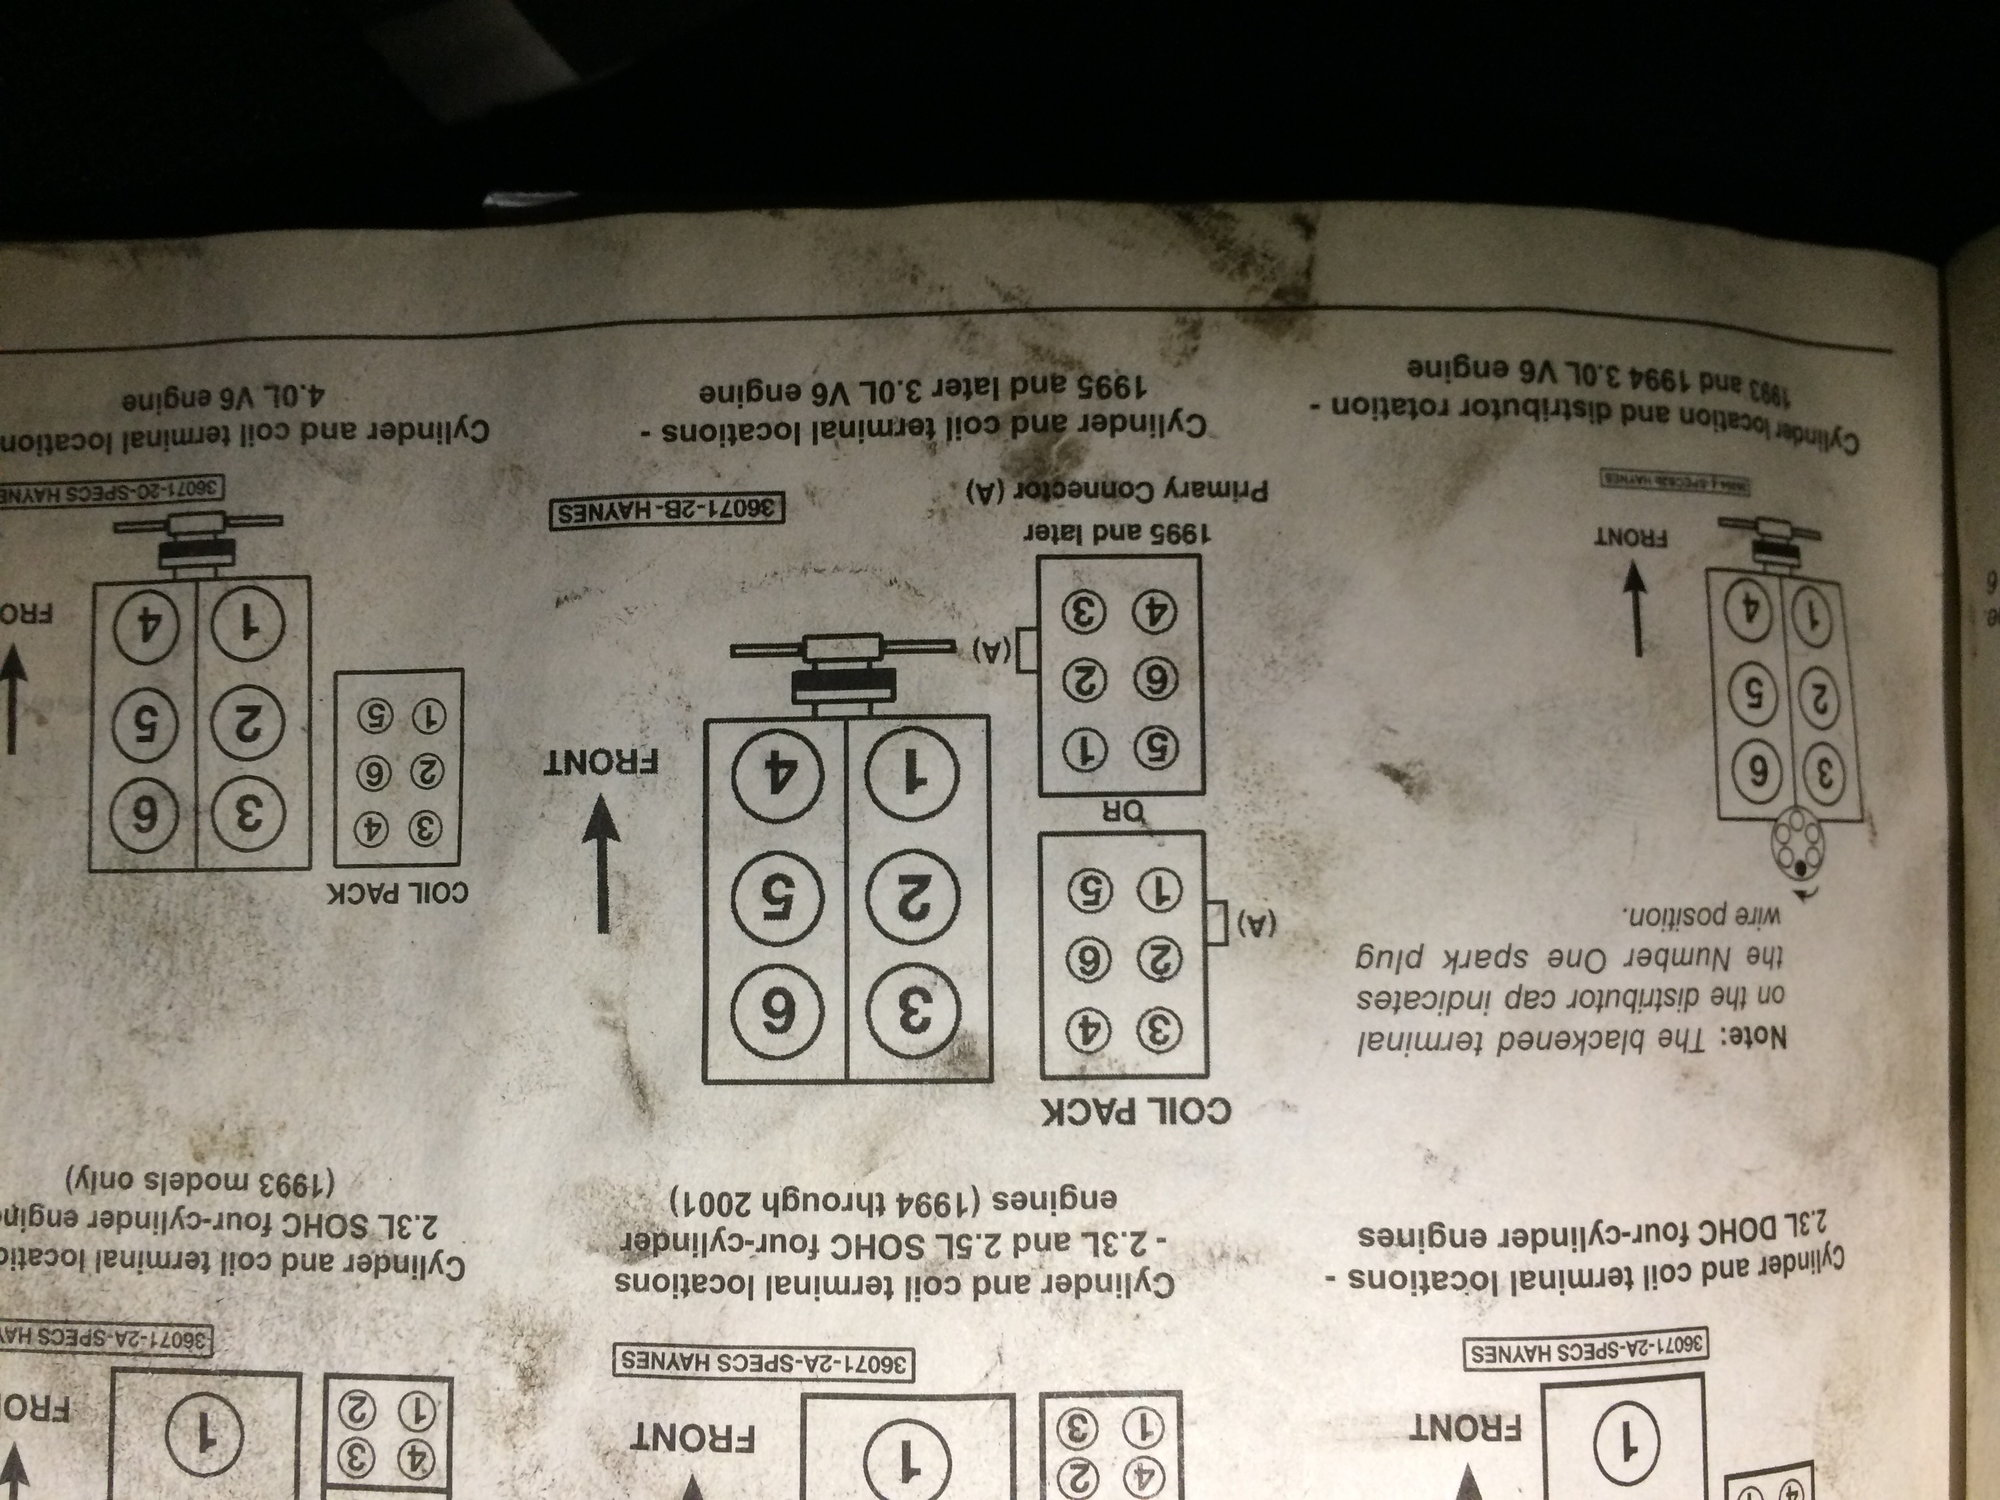 96 Mustang Gt Spark Plug Wiring Diagram Circuit Diagrams Image